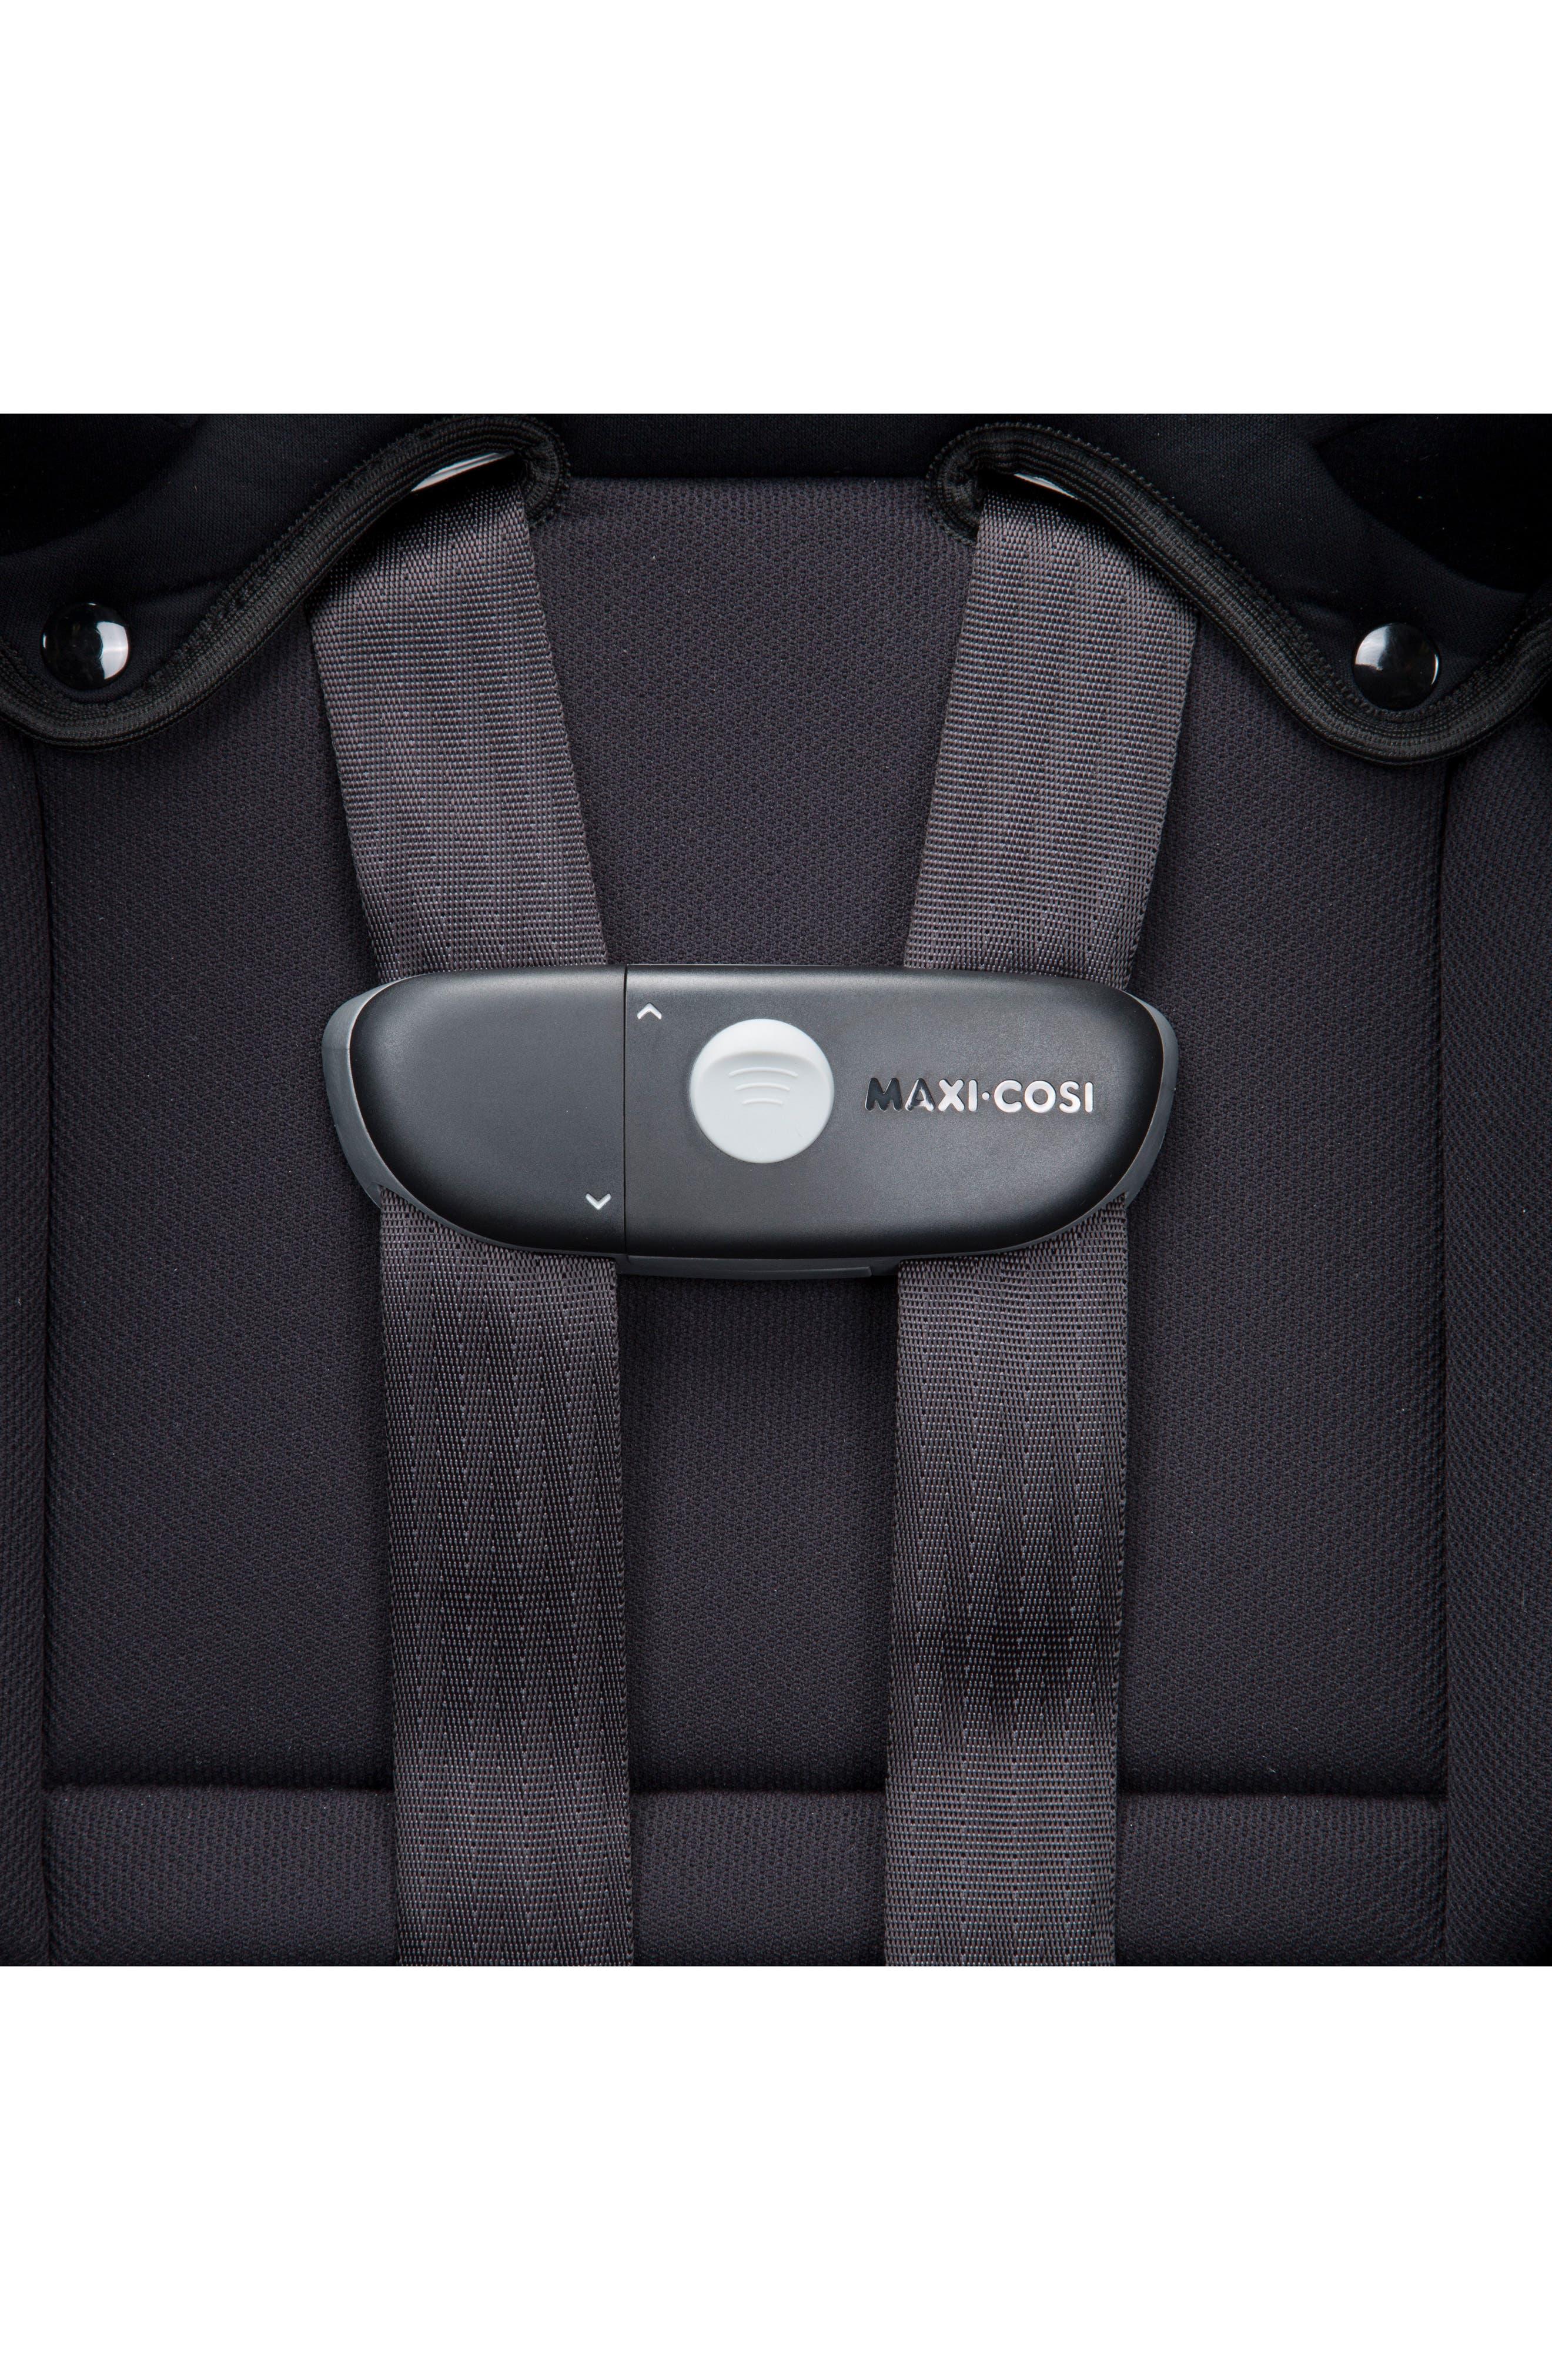 Pria<sup>™</sup> 85 Max Convertible Car Seat,                             Alternate thumbnail 8, color,                             Night Black